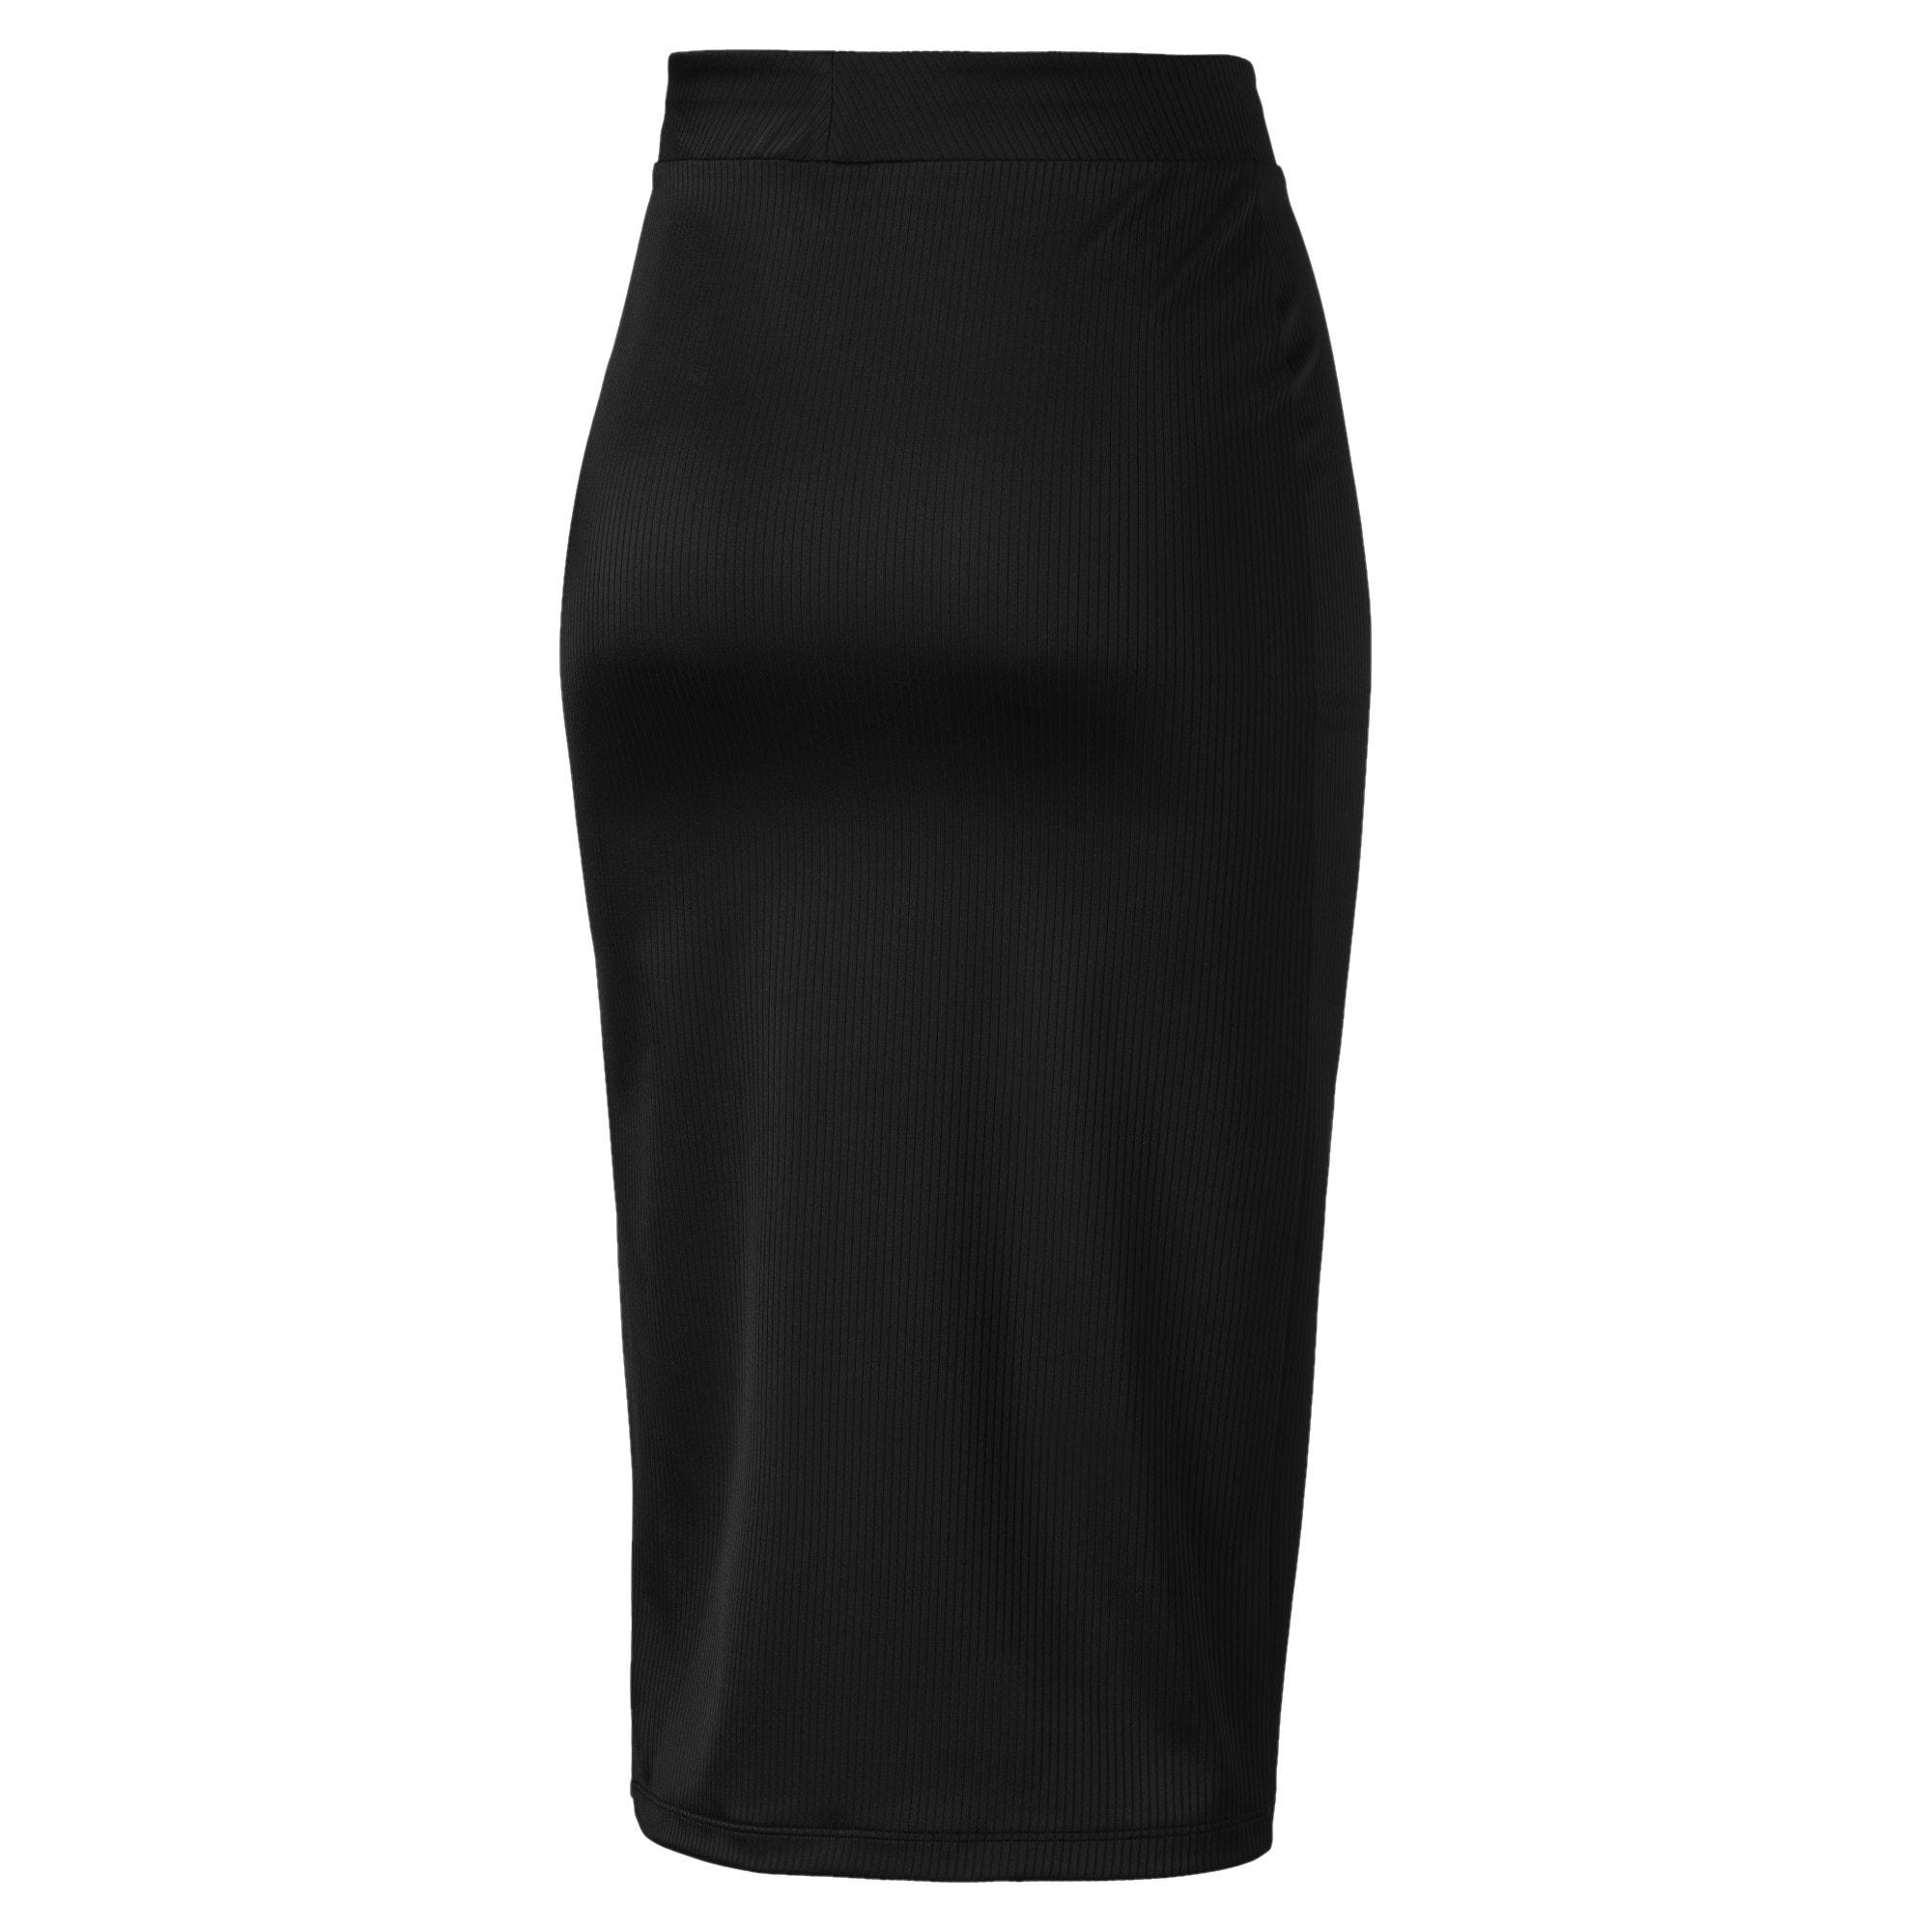 Thumbnail 5 of Classics Women's Skirt, Puma Black, medium